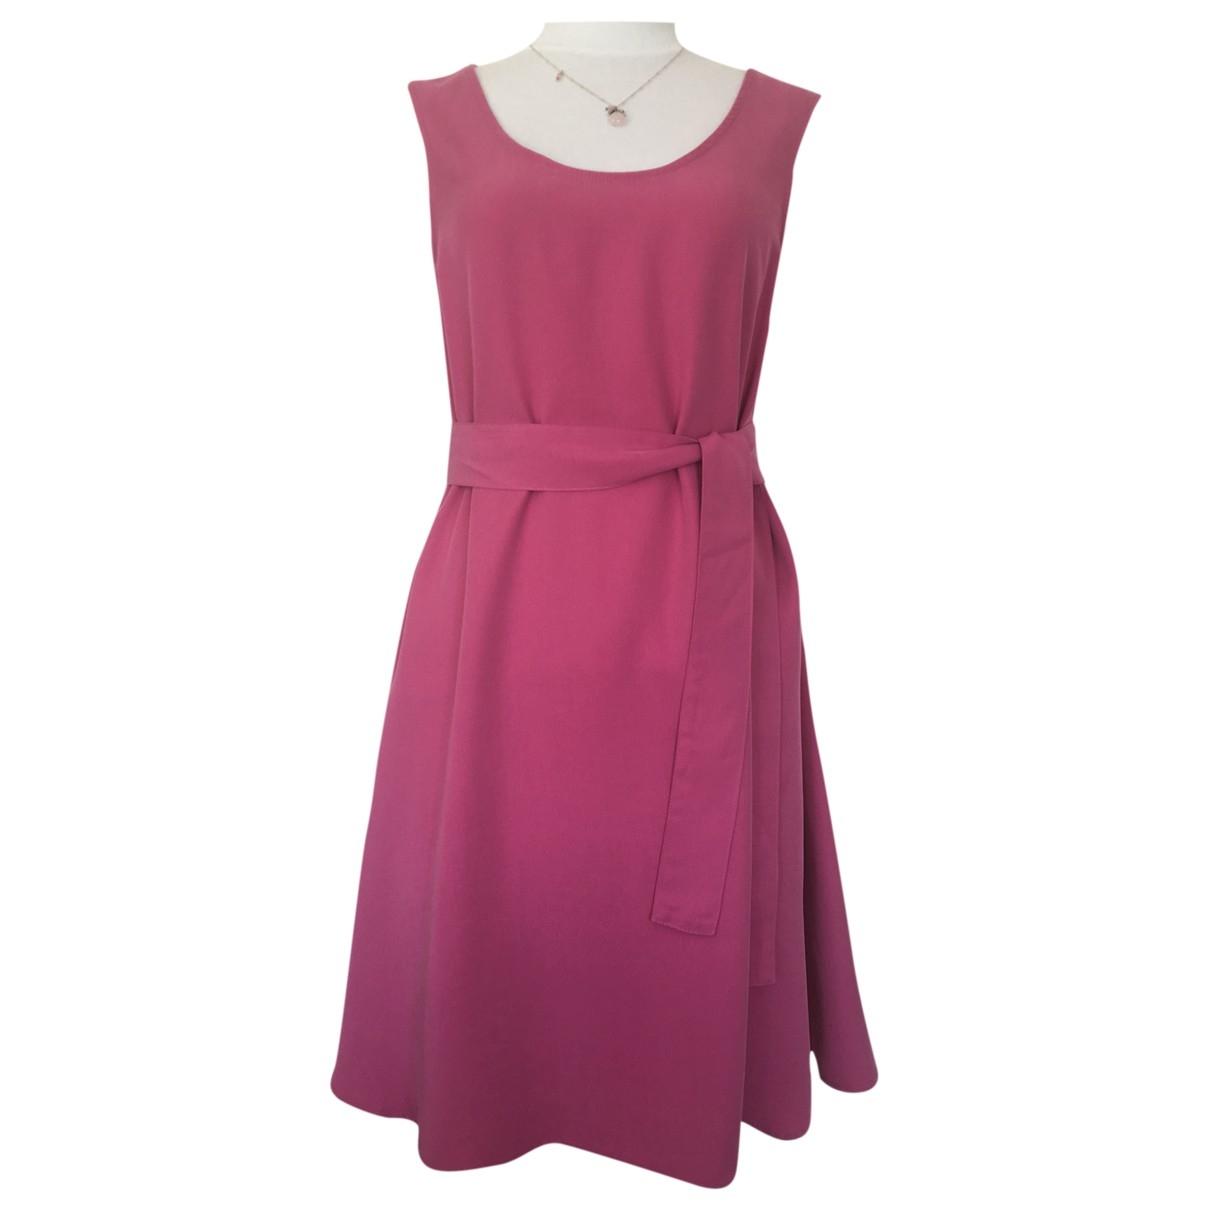 American Vintage \N Pink Cotton dress for Women M International